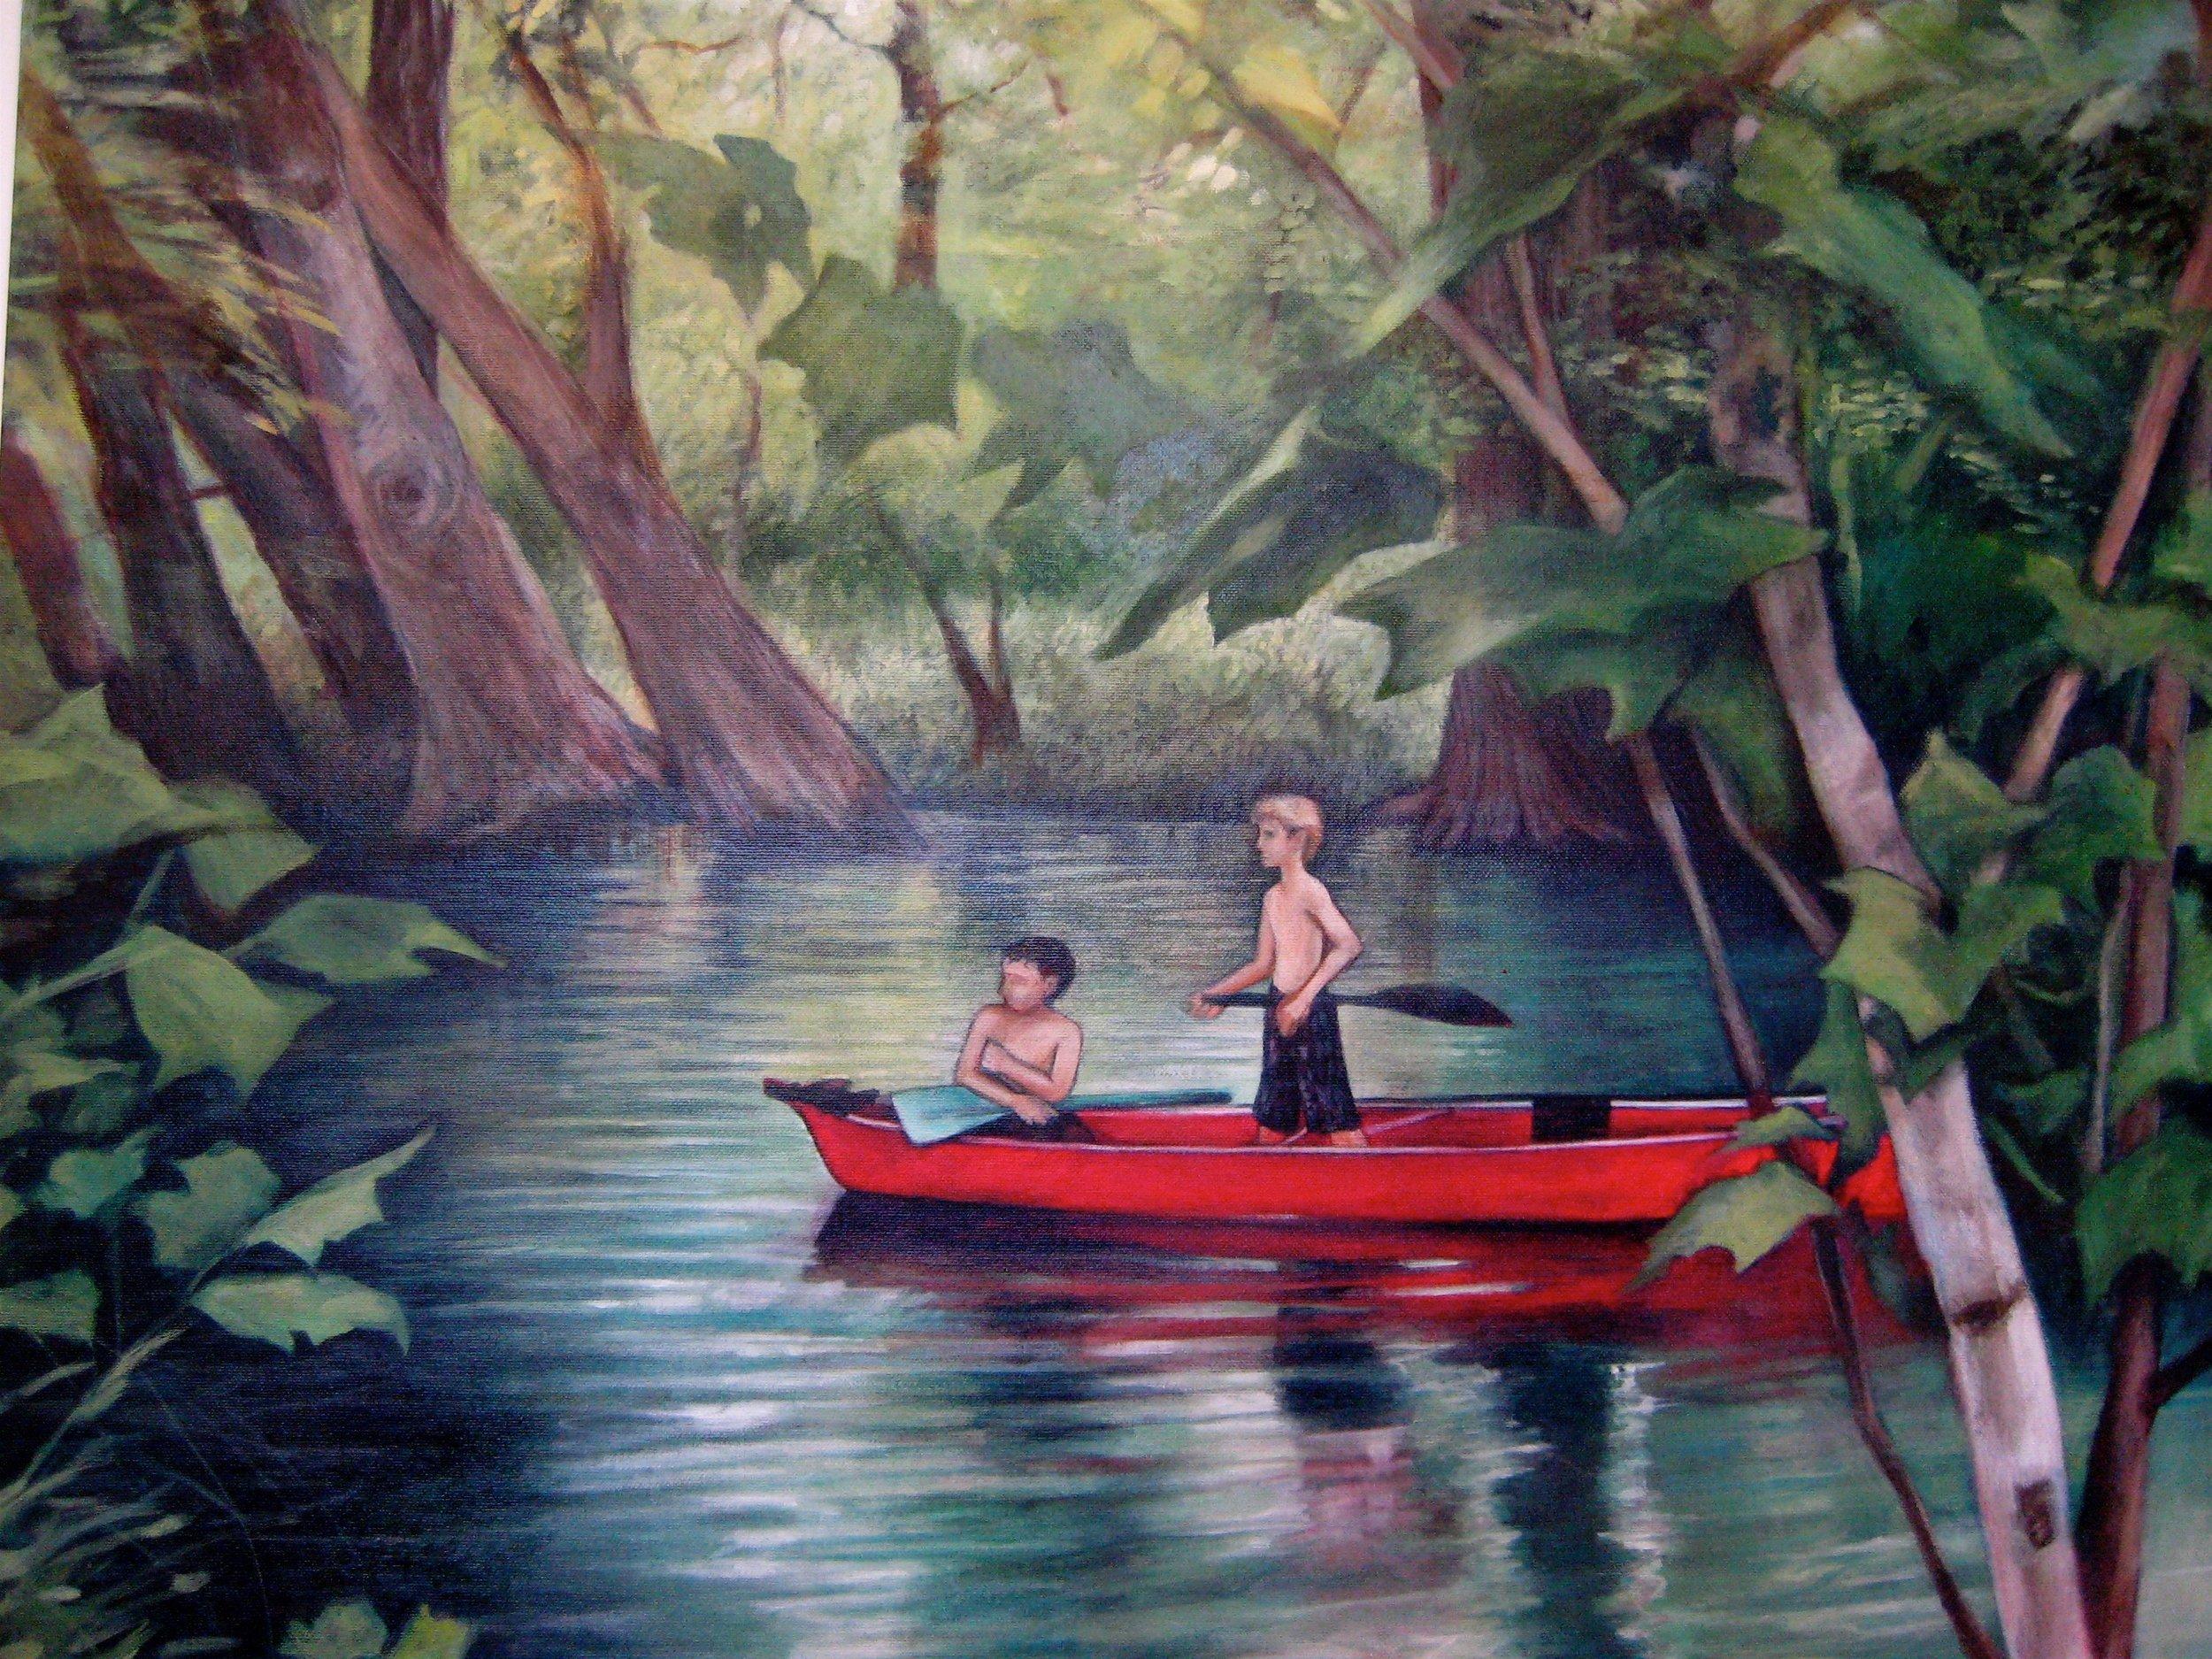 River Boys